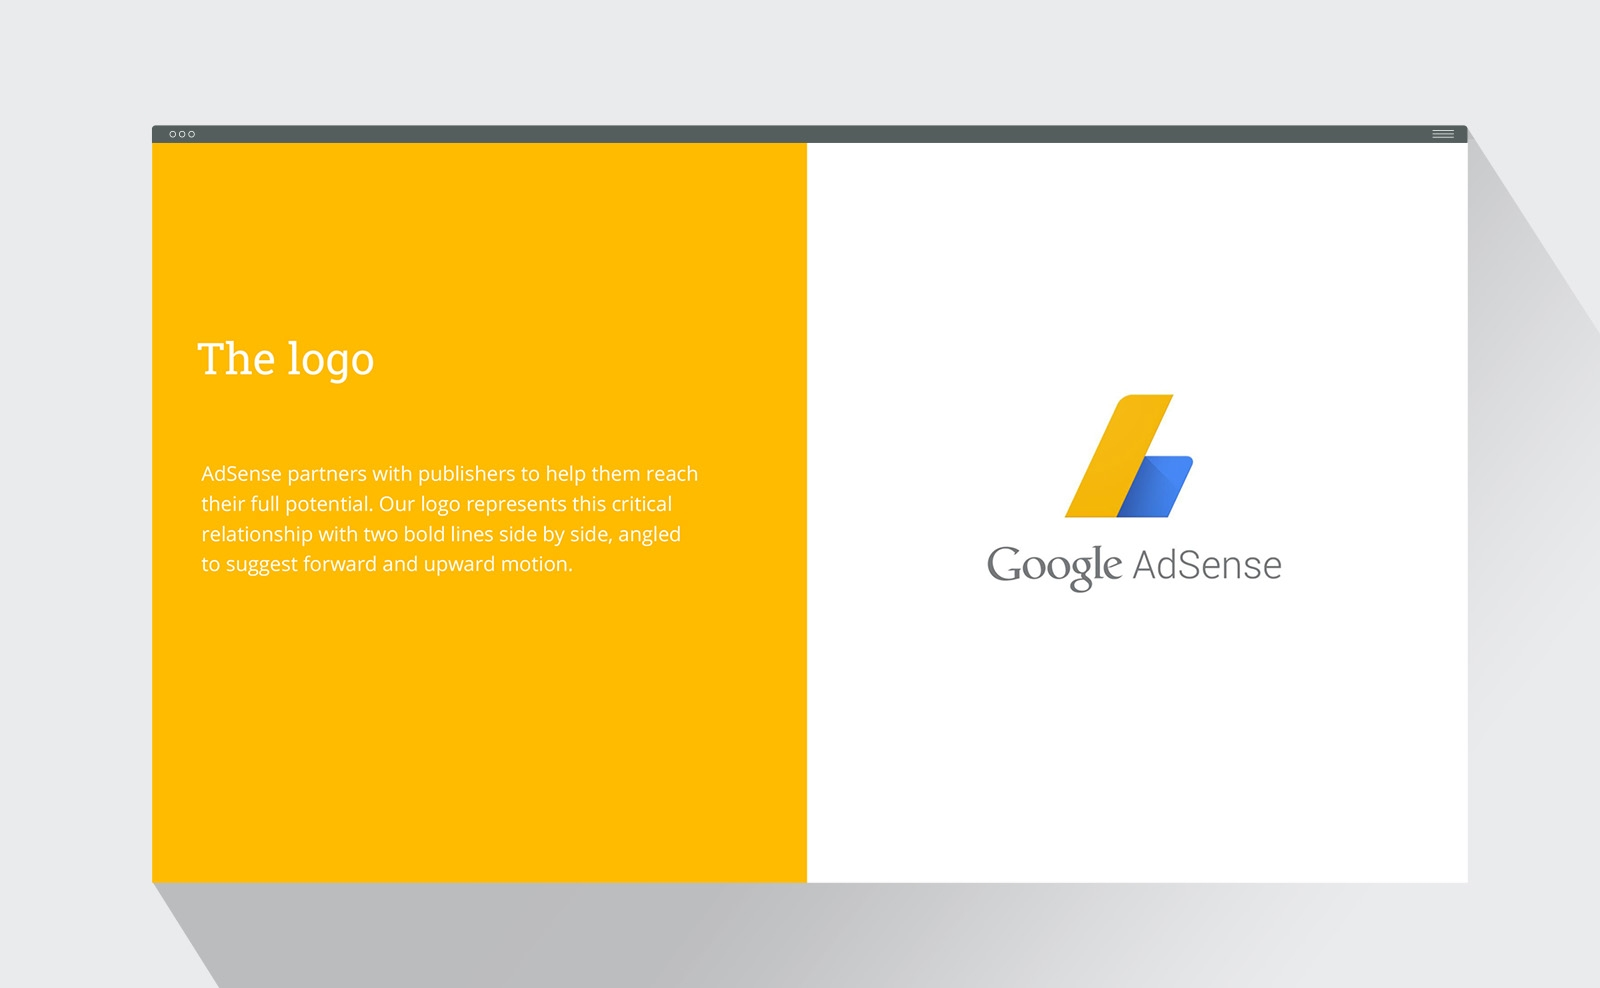 Google AdSense brand style guide logo